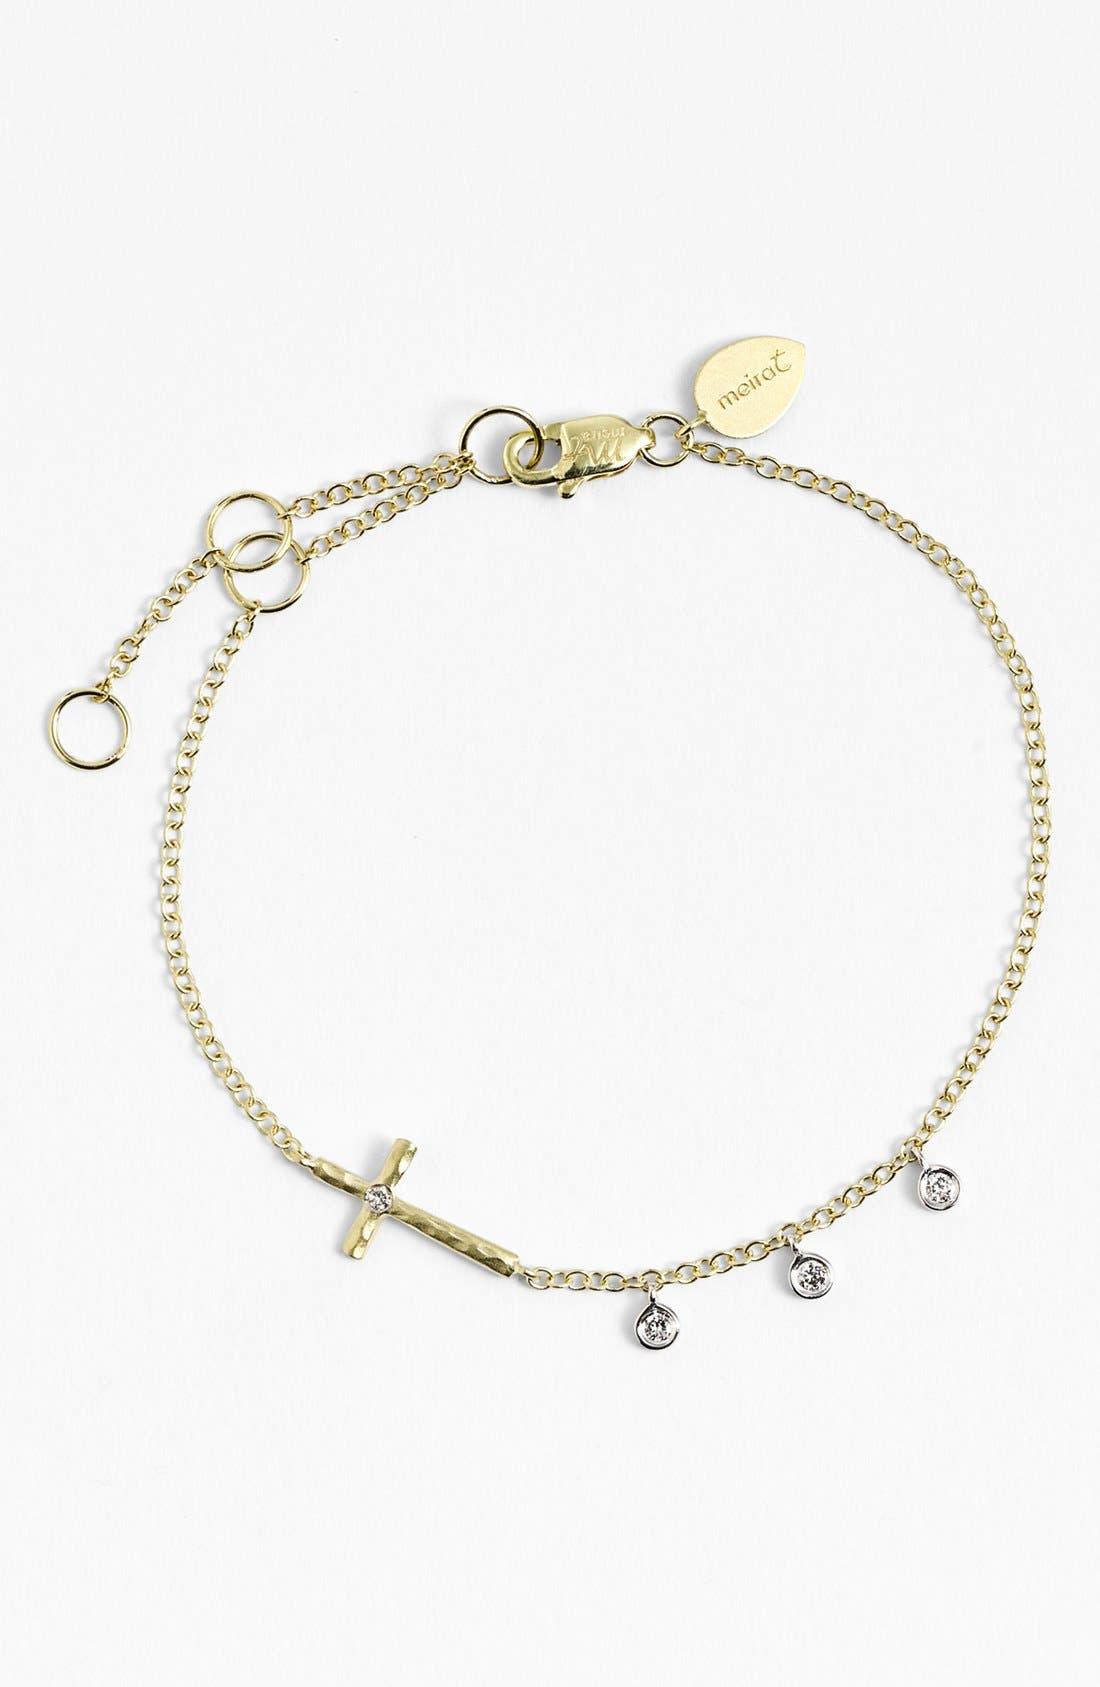 Main Image - MeiraT 'Charmed' Diamond Charm Bracelet